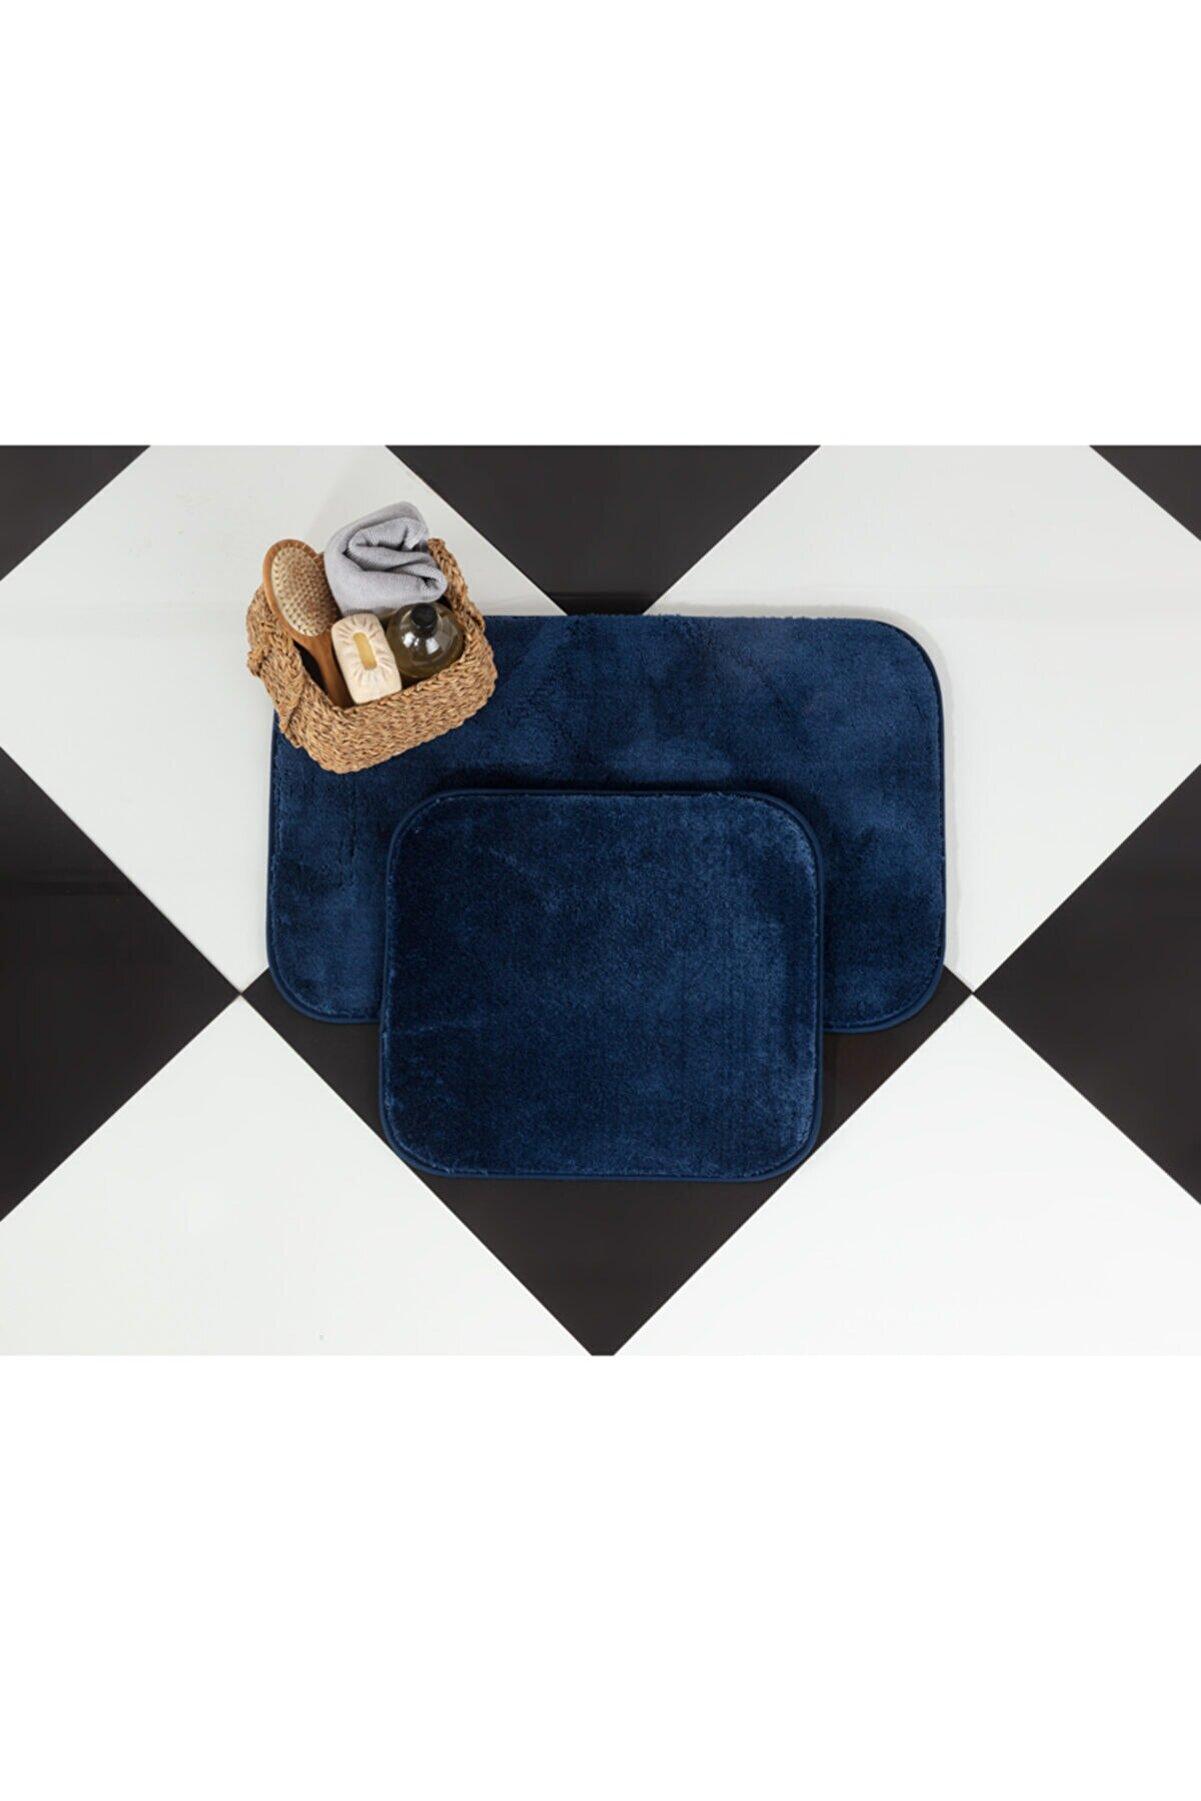 Madame Coco Carol 2'li Banyo Paspası - Indigo - 50x80 45x50 Cm